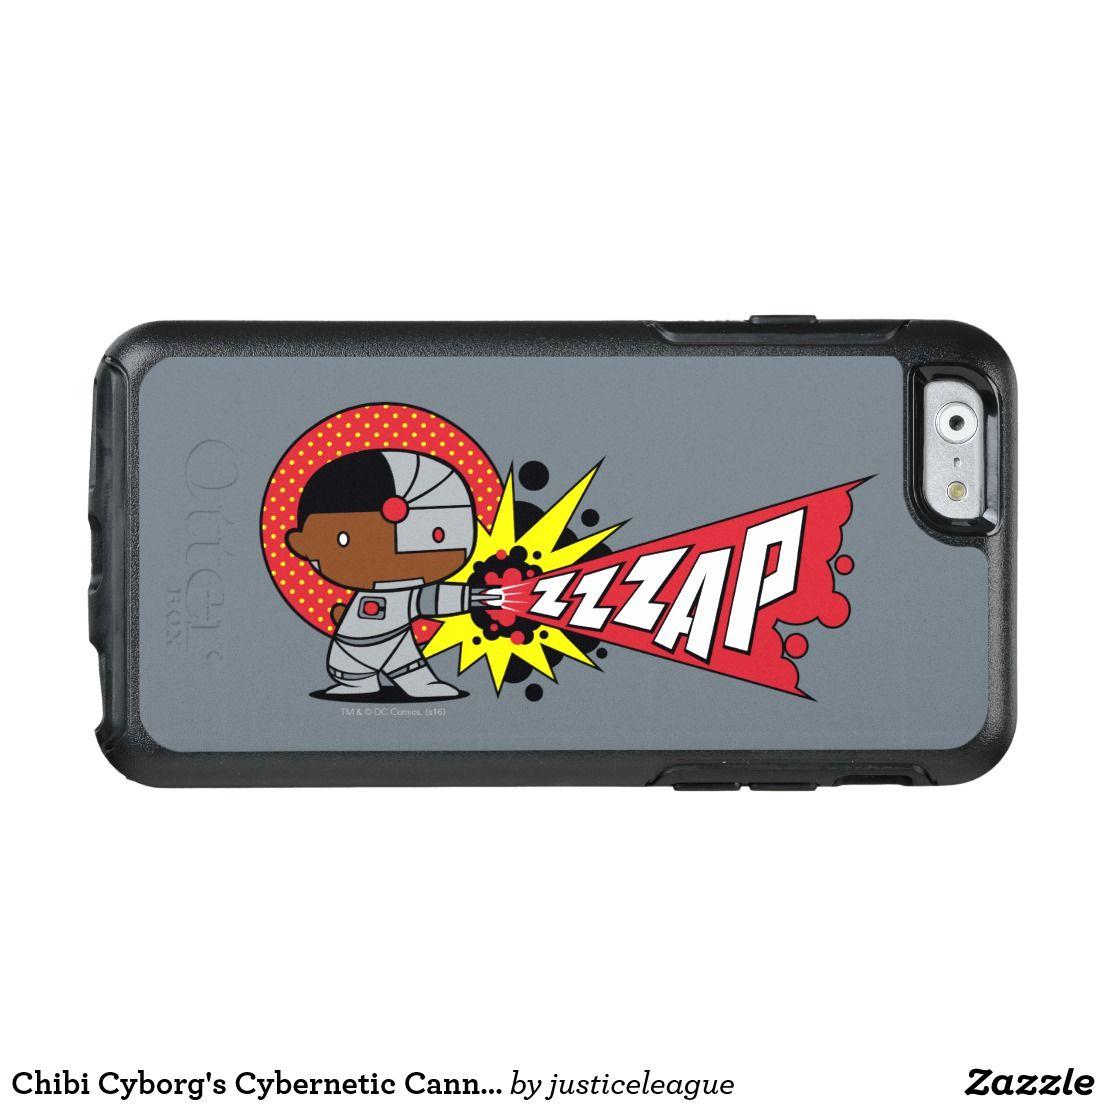 Chibi Cyborg S Cybernetic Cannon Otterbox Iphone Case Zazzle Com Iphone Cases Otterbox Otterbox Iphone Chibi